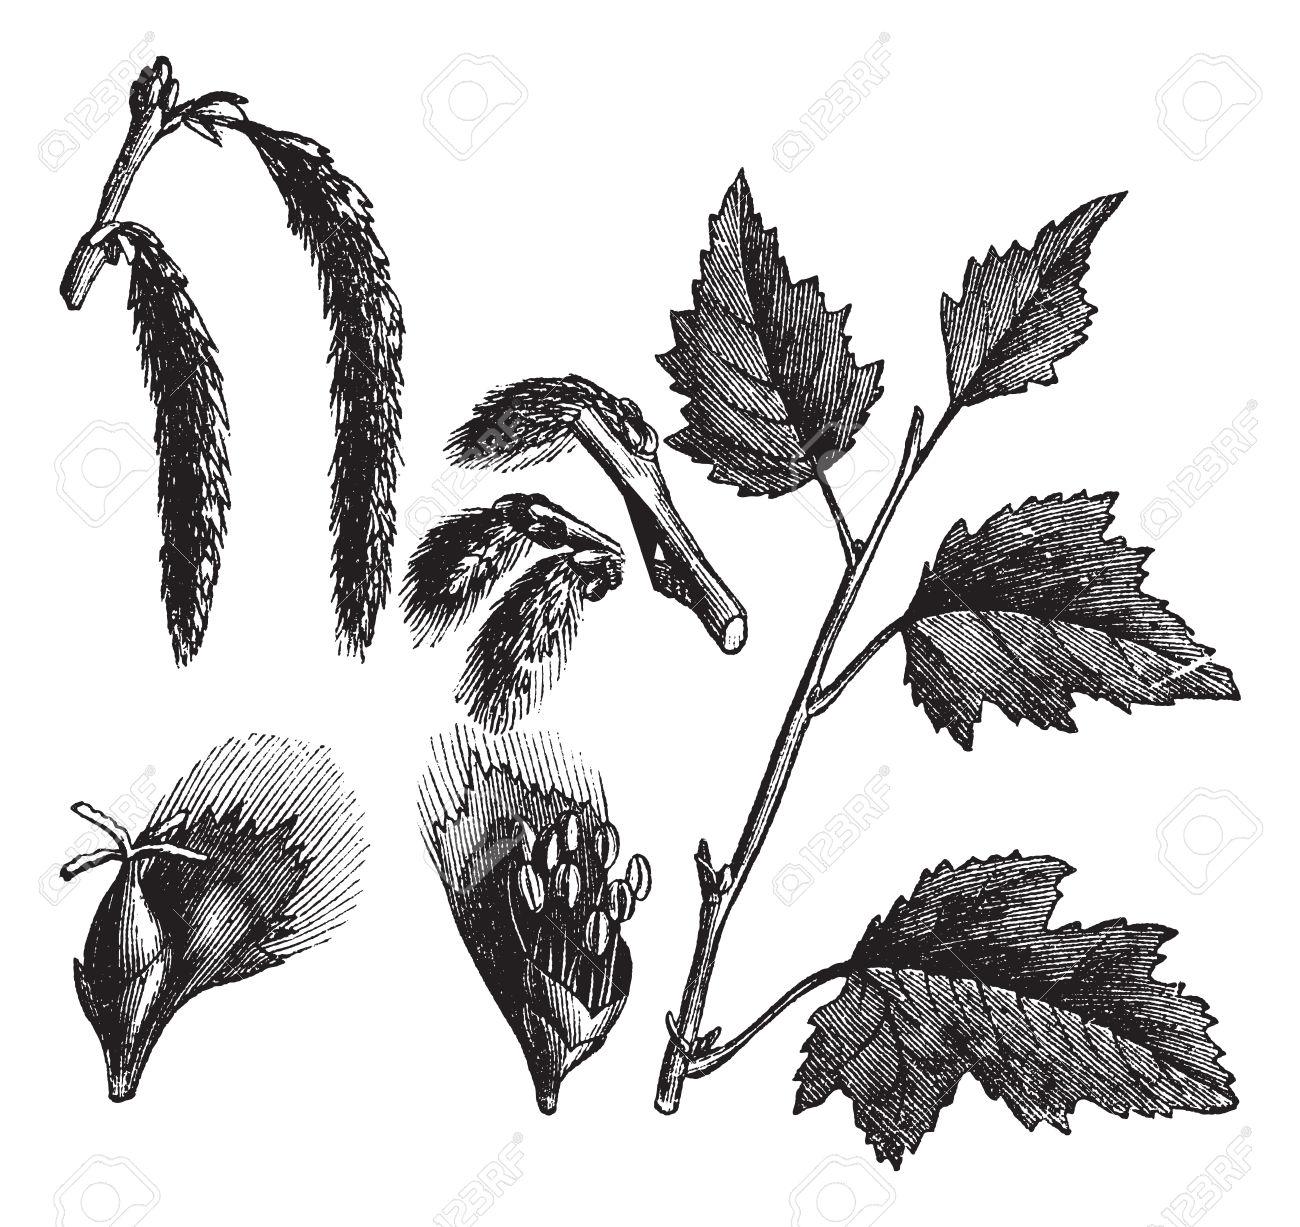 White Poplar Or Populus Alba, Vintage Engraved Illustration.